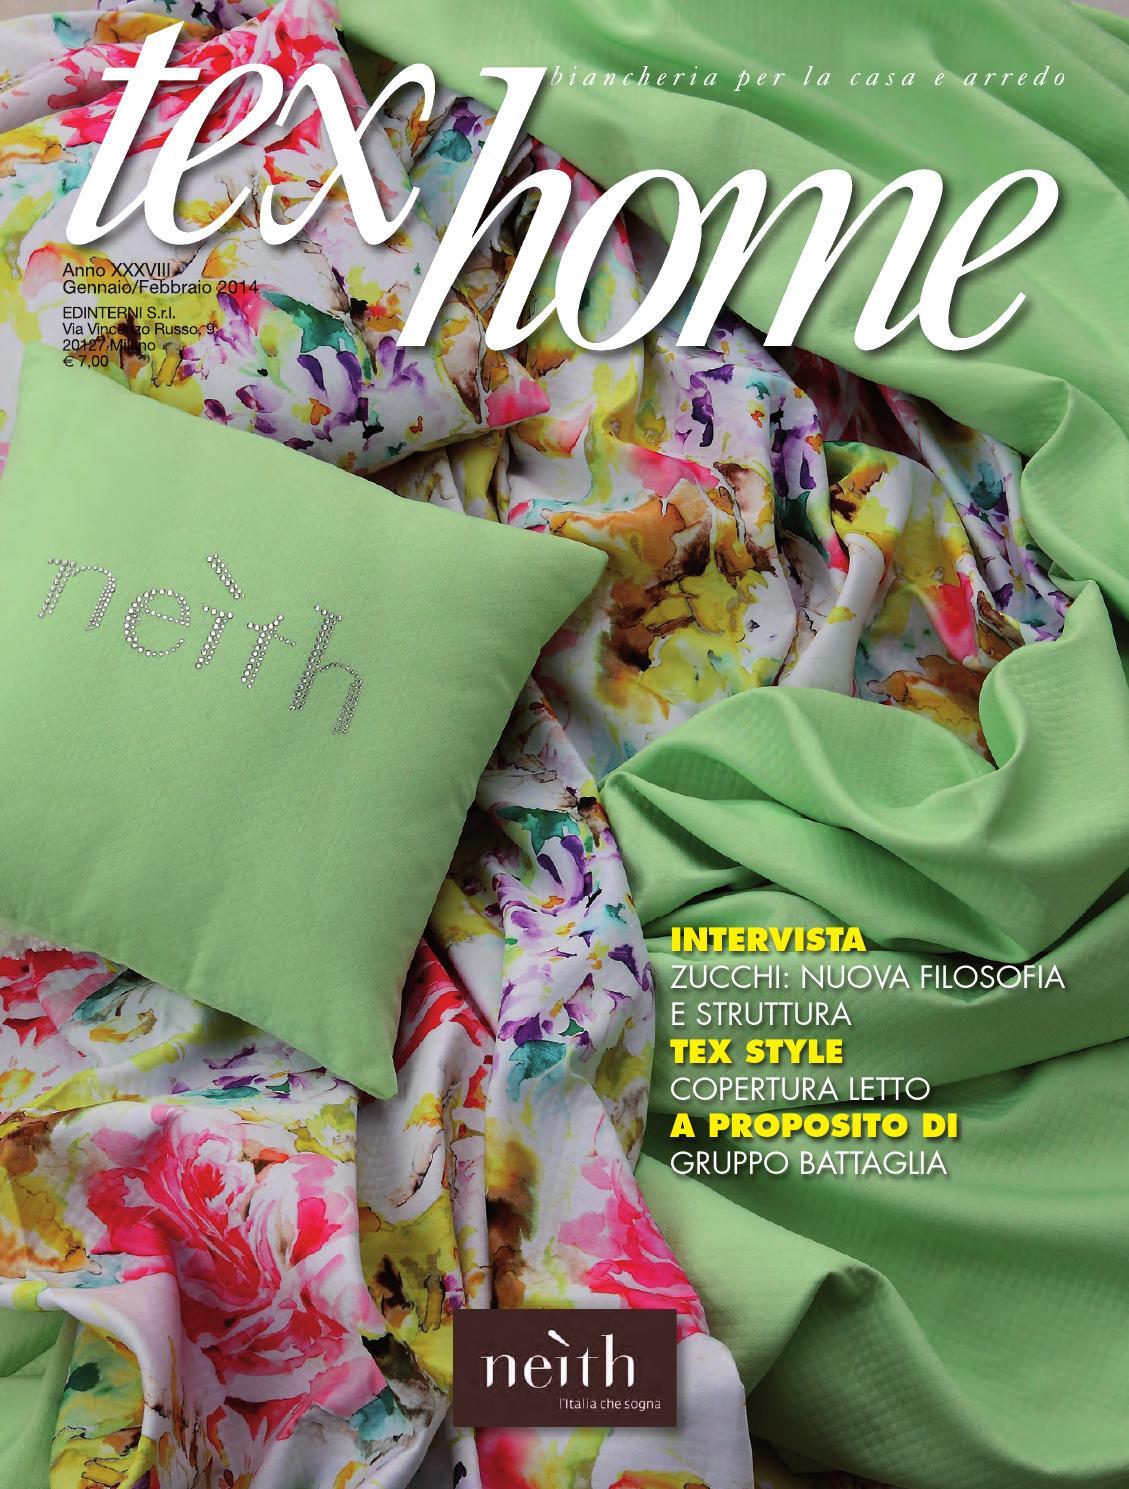 Negozi Biancheria Casa Torino tex home gennaio febbraio 2014 by edinterni srl - issuu